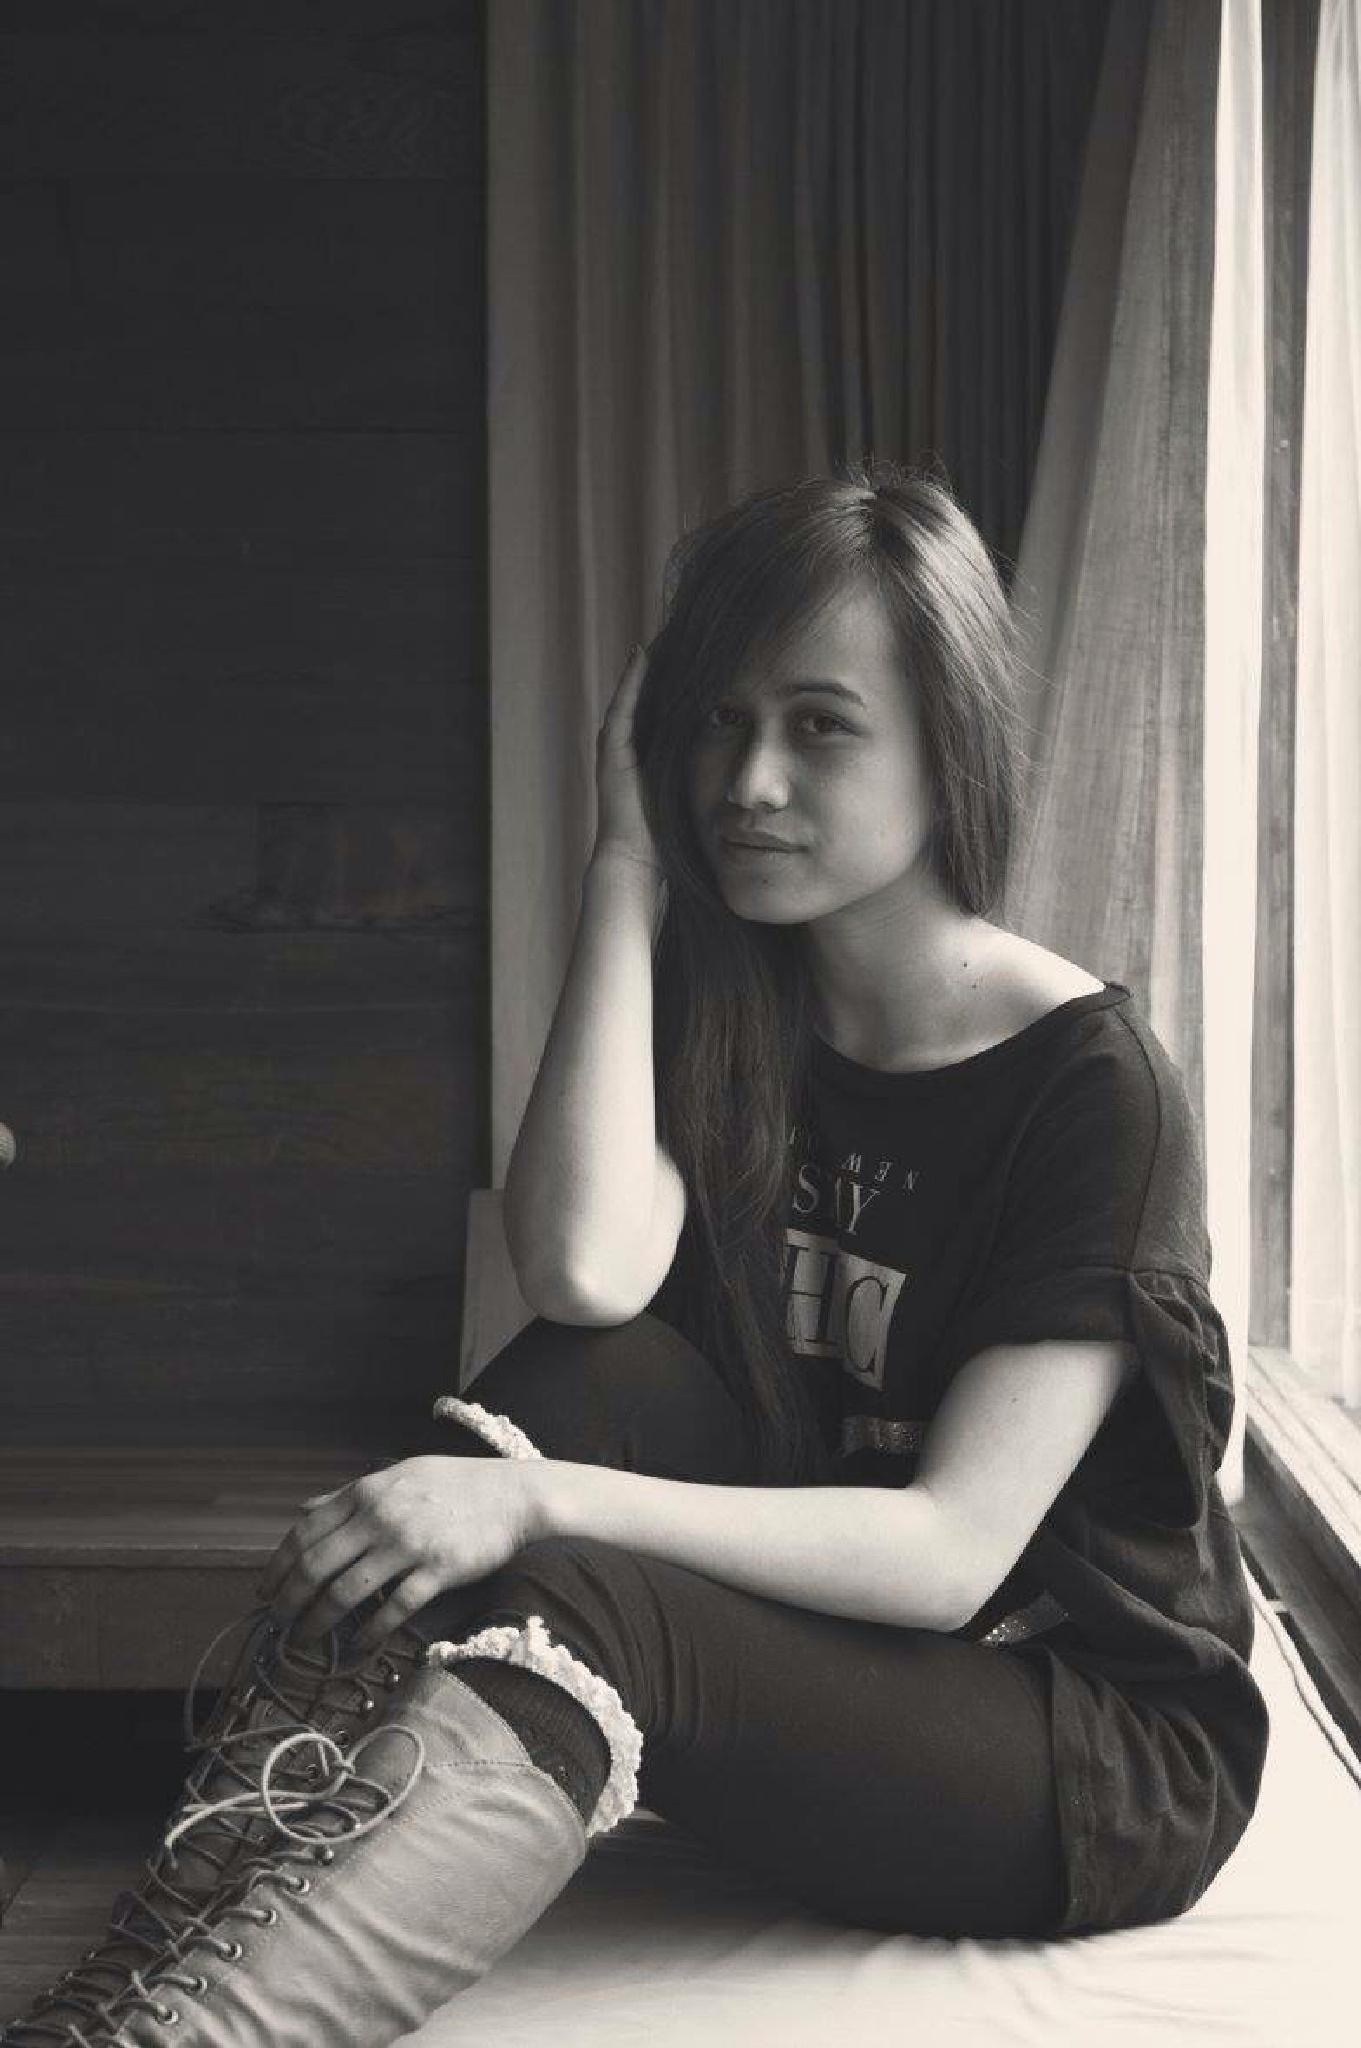 Black and white olivia by Angelina Desiree